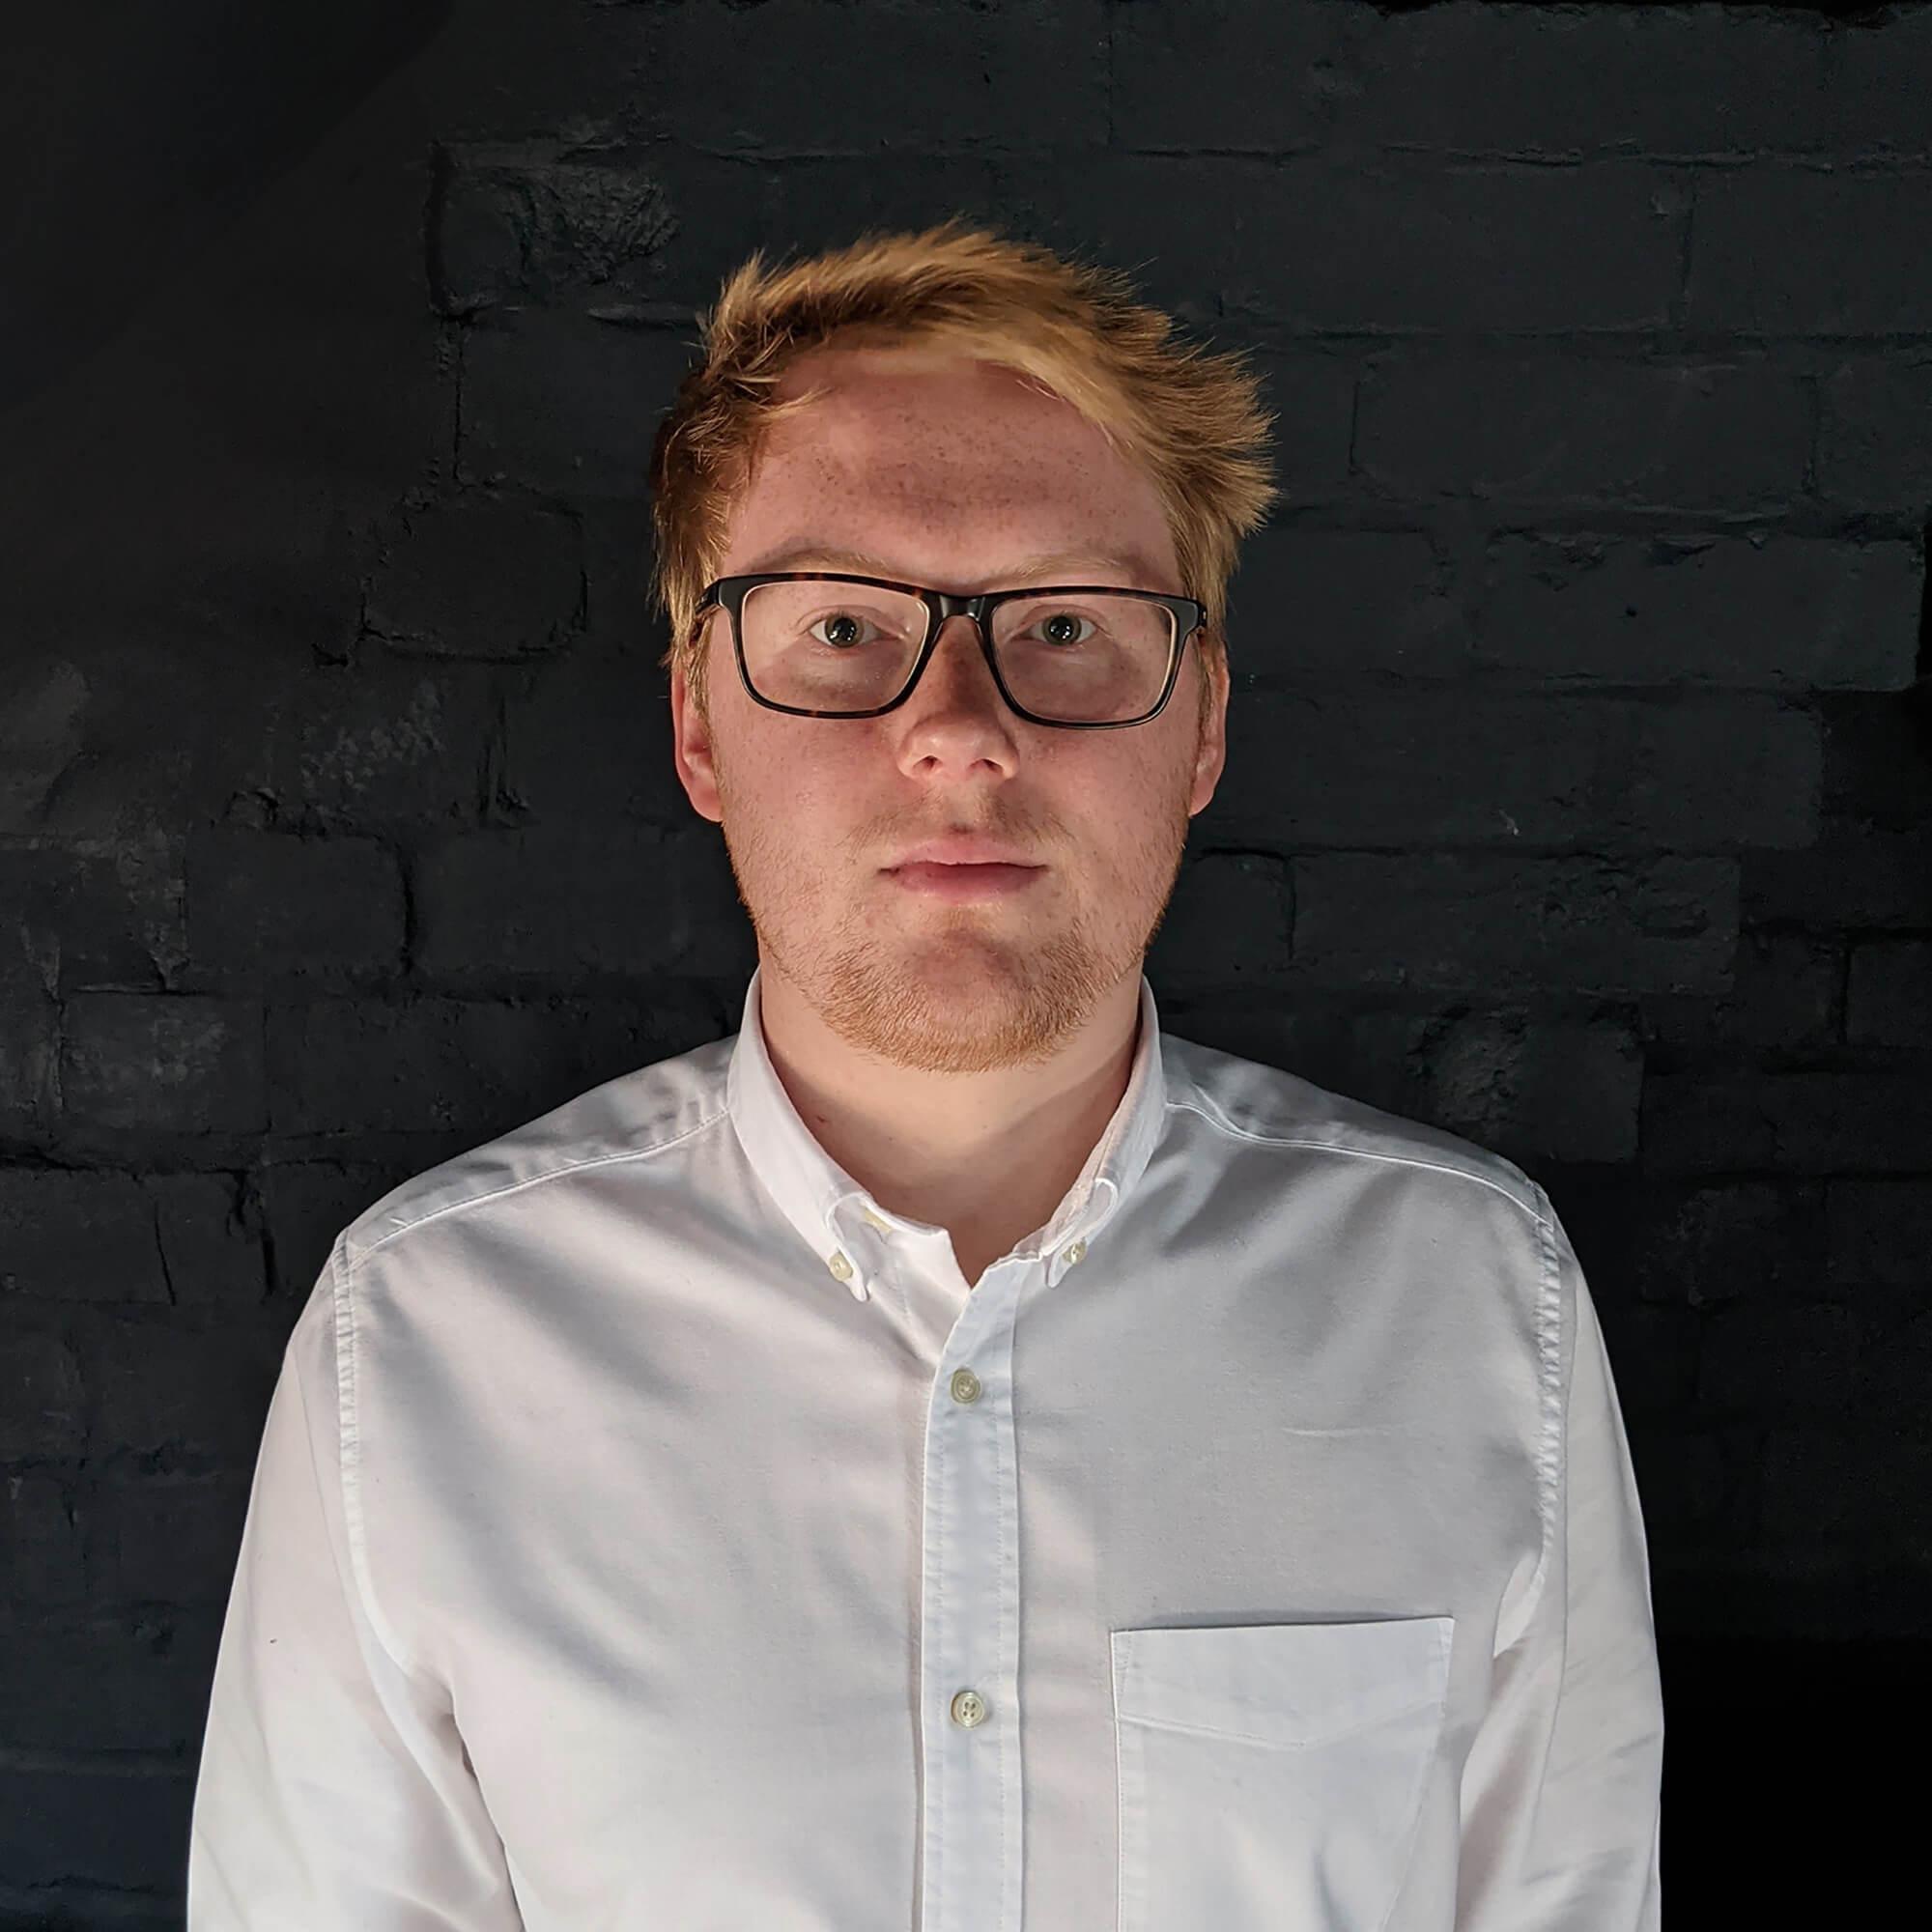 Headshot of student Jacob Flint